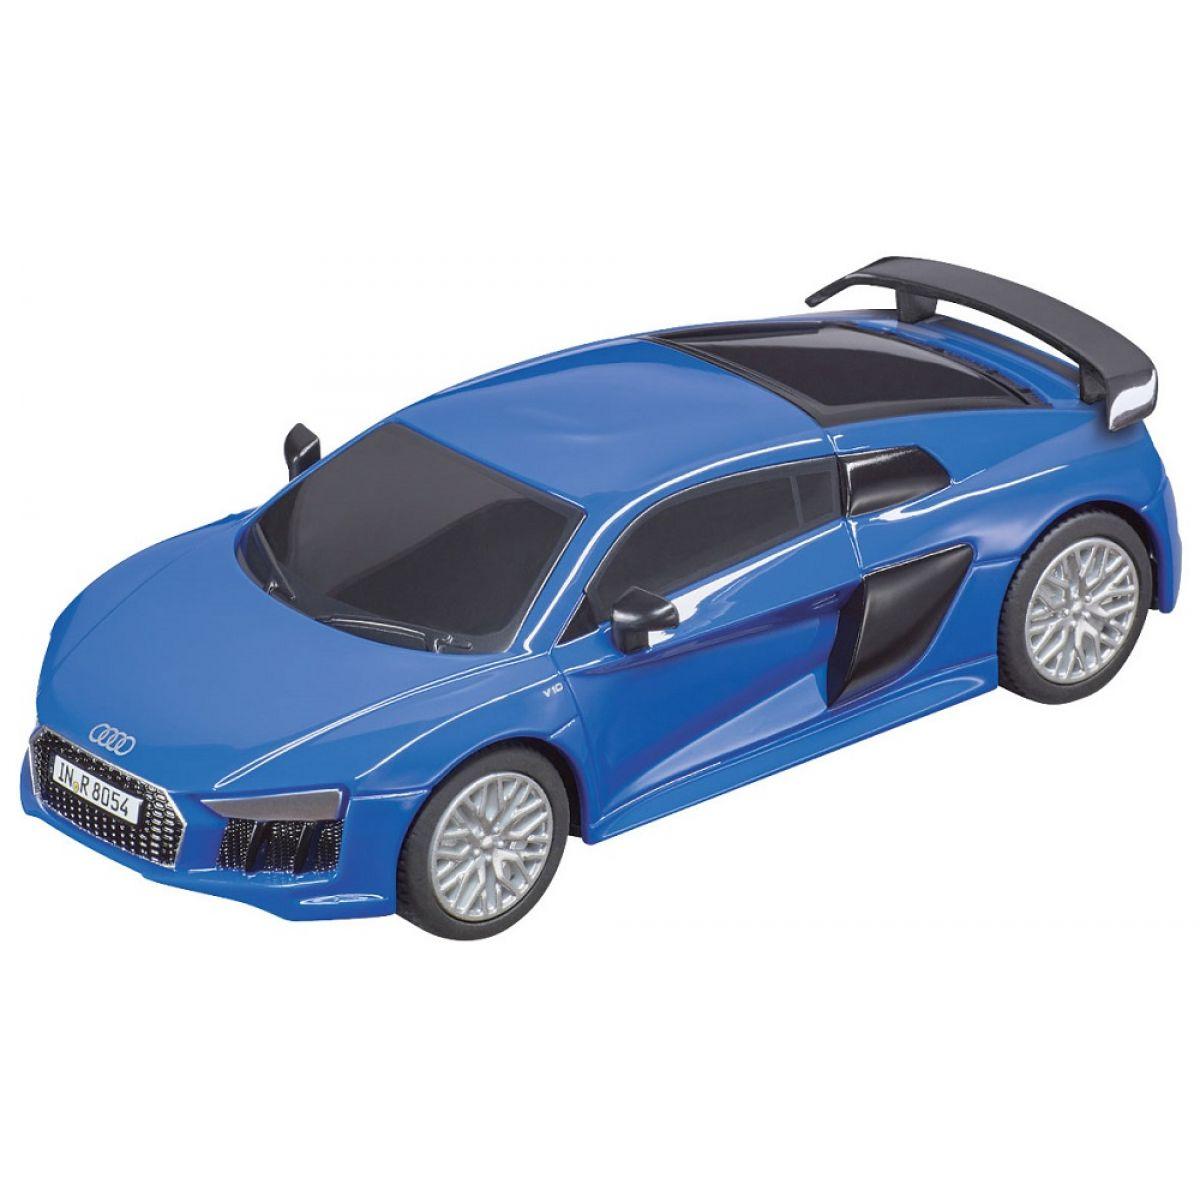 Carrera GO 64059 Audi R8 V10 Plus